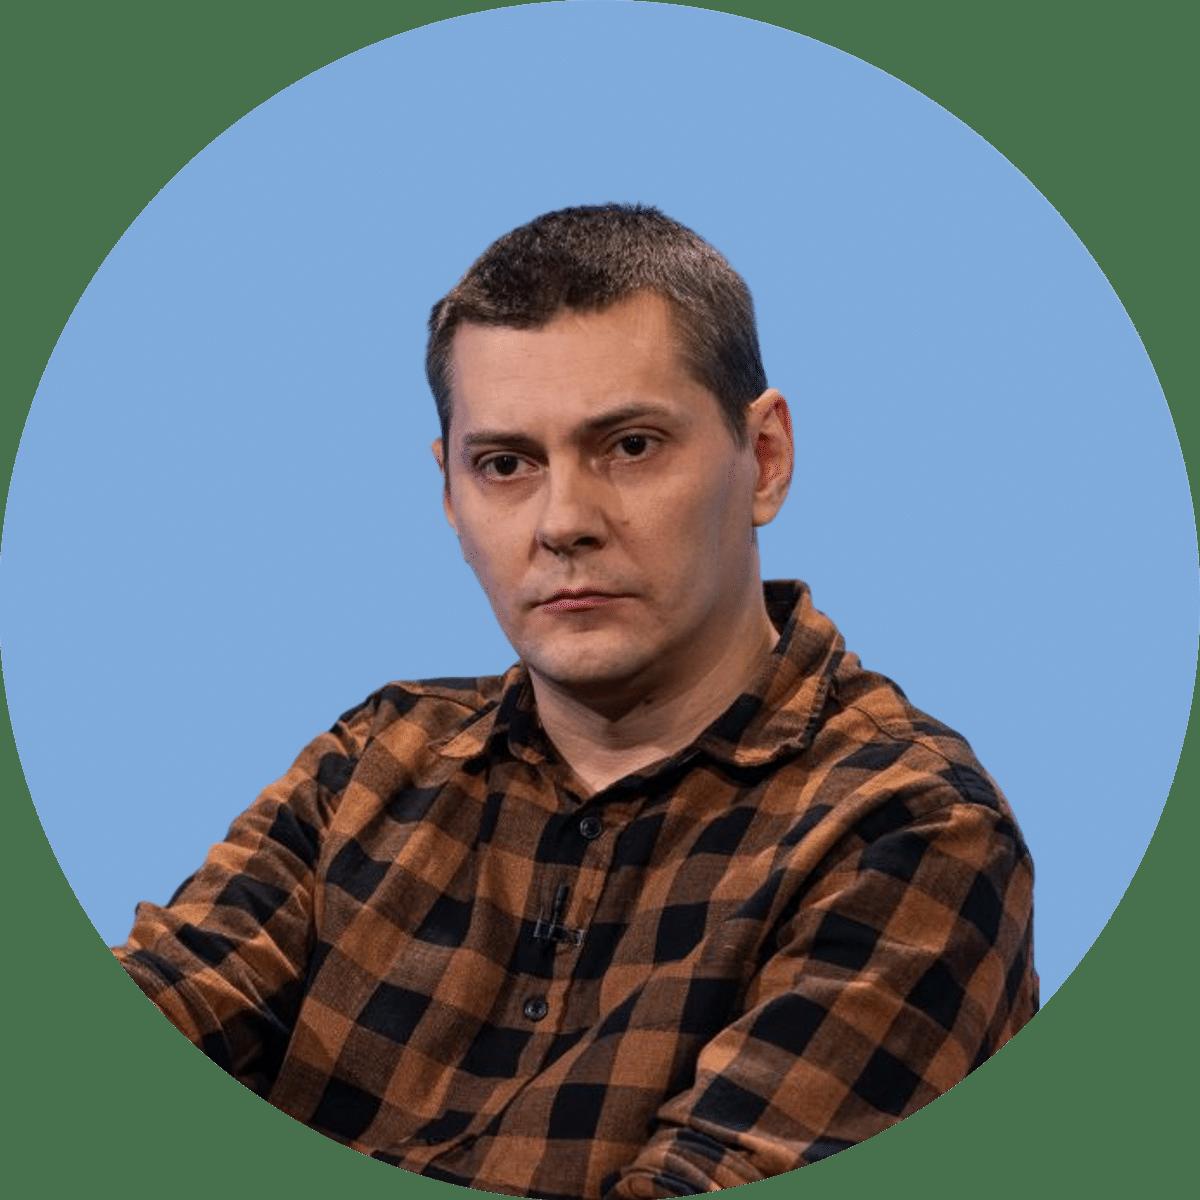 Marko Šelić Marčelo, pisac i muzičar